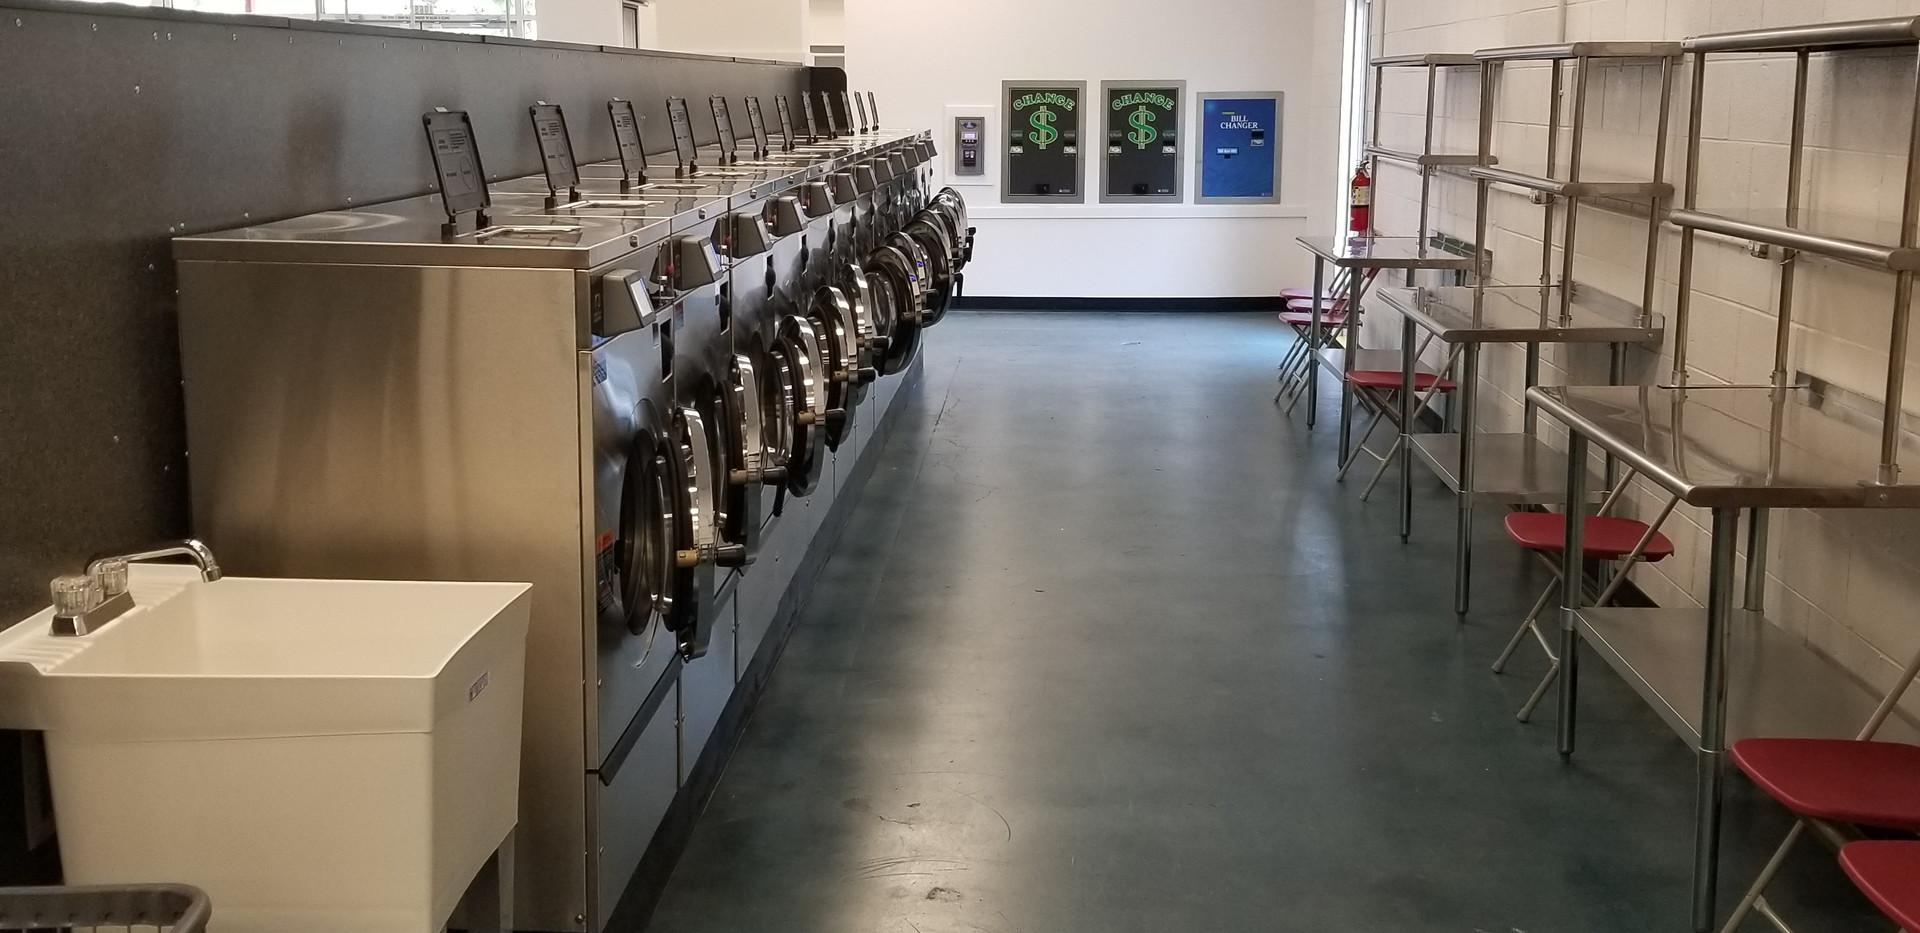 Wash'em Up #6 Soaking Sinks